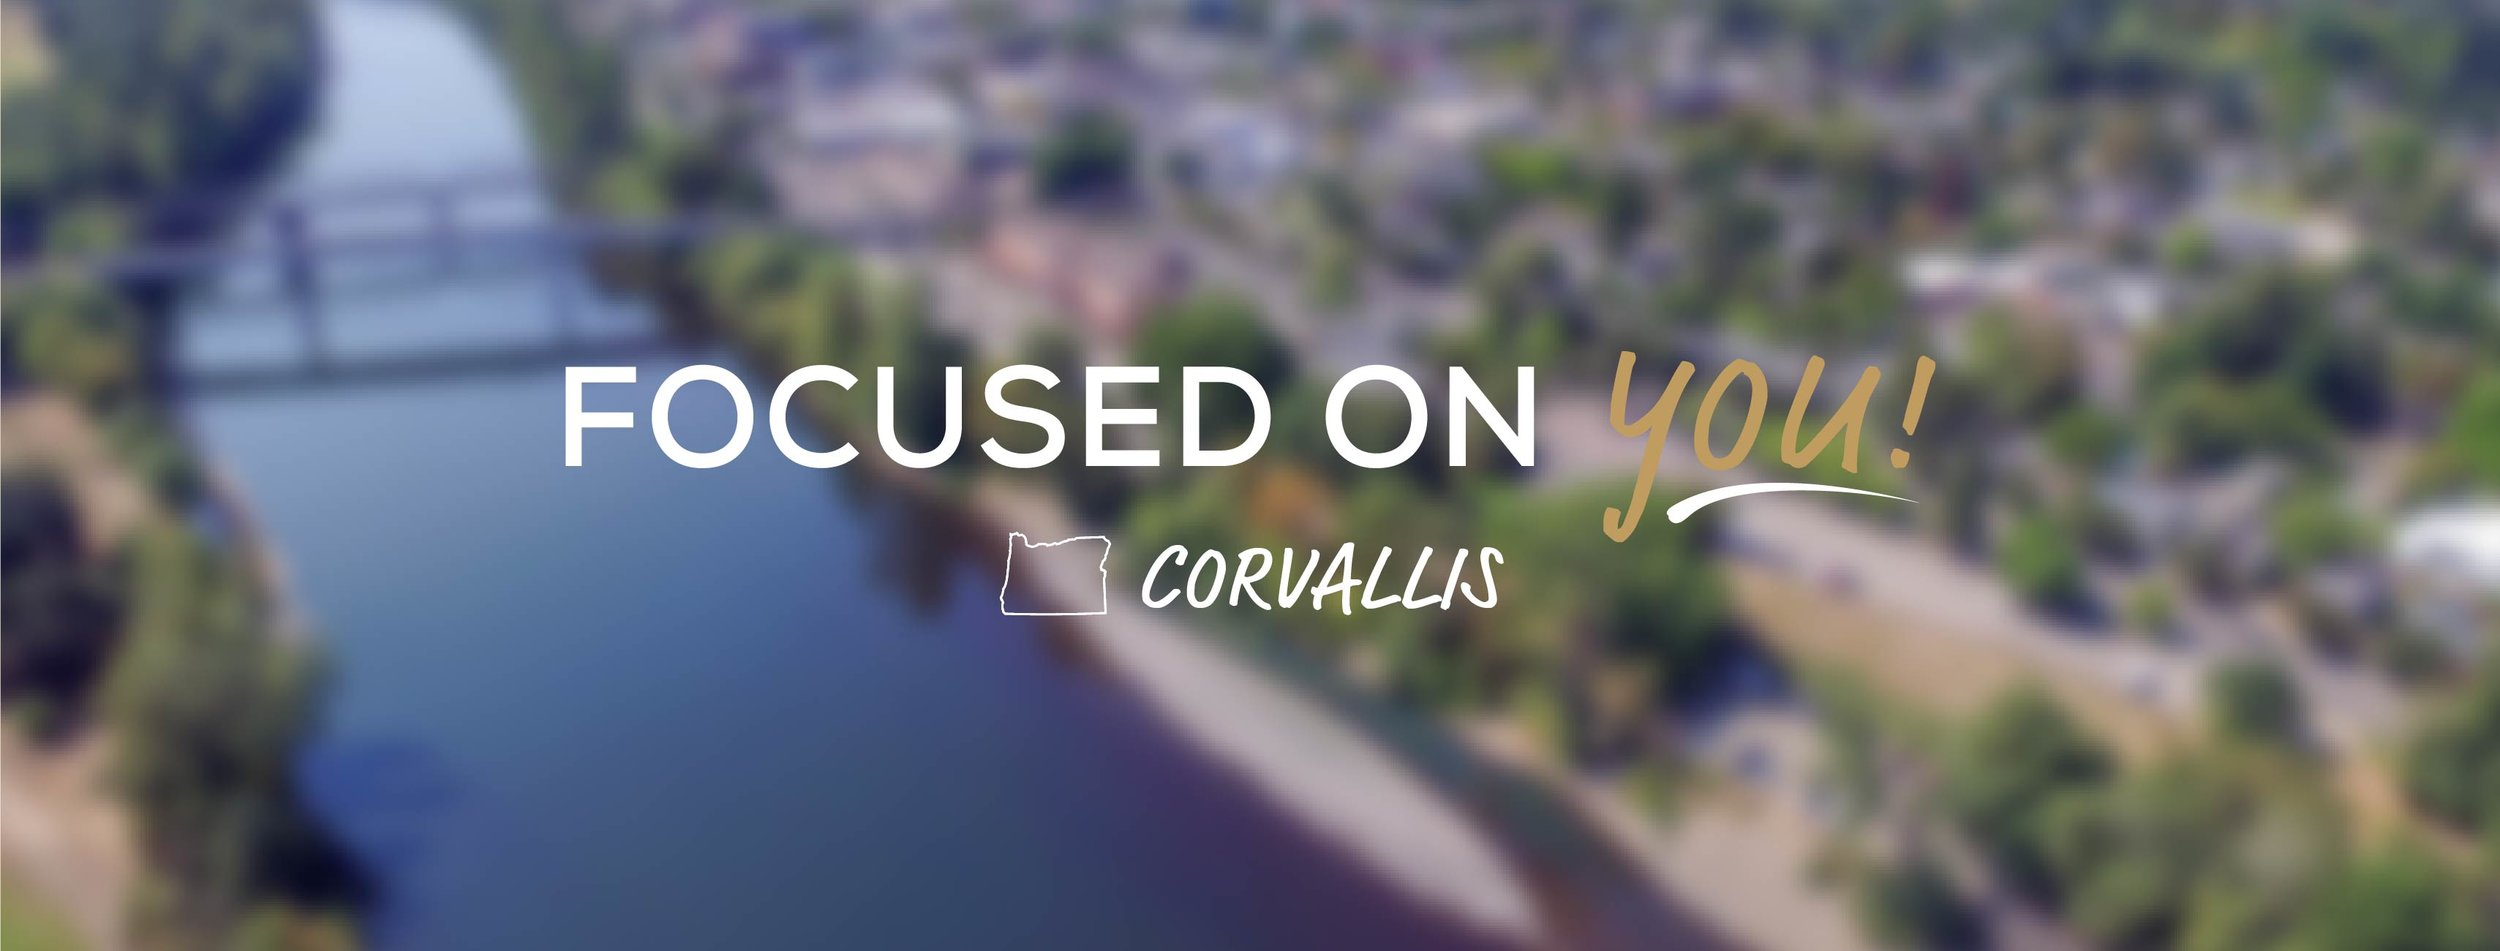 Corvallis - 541.286.4165corvallis@directorsmortgage.net430 NW 3rd StreetCorvallis, OR 97330